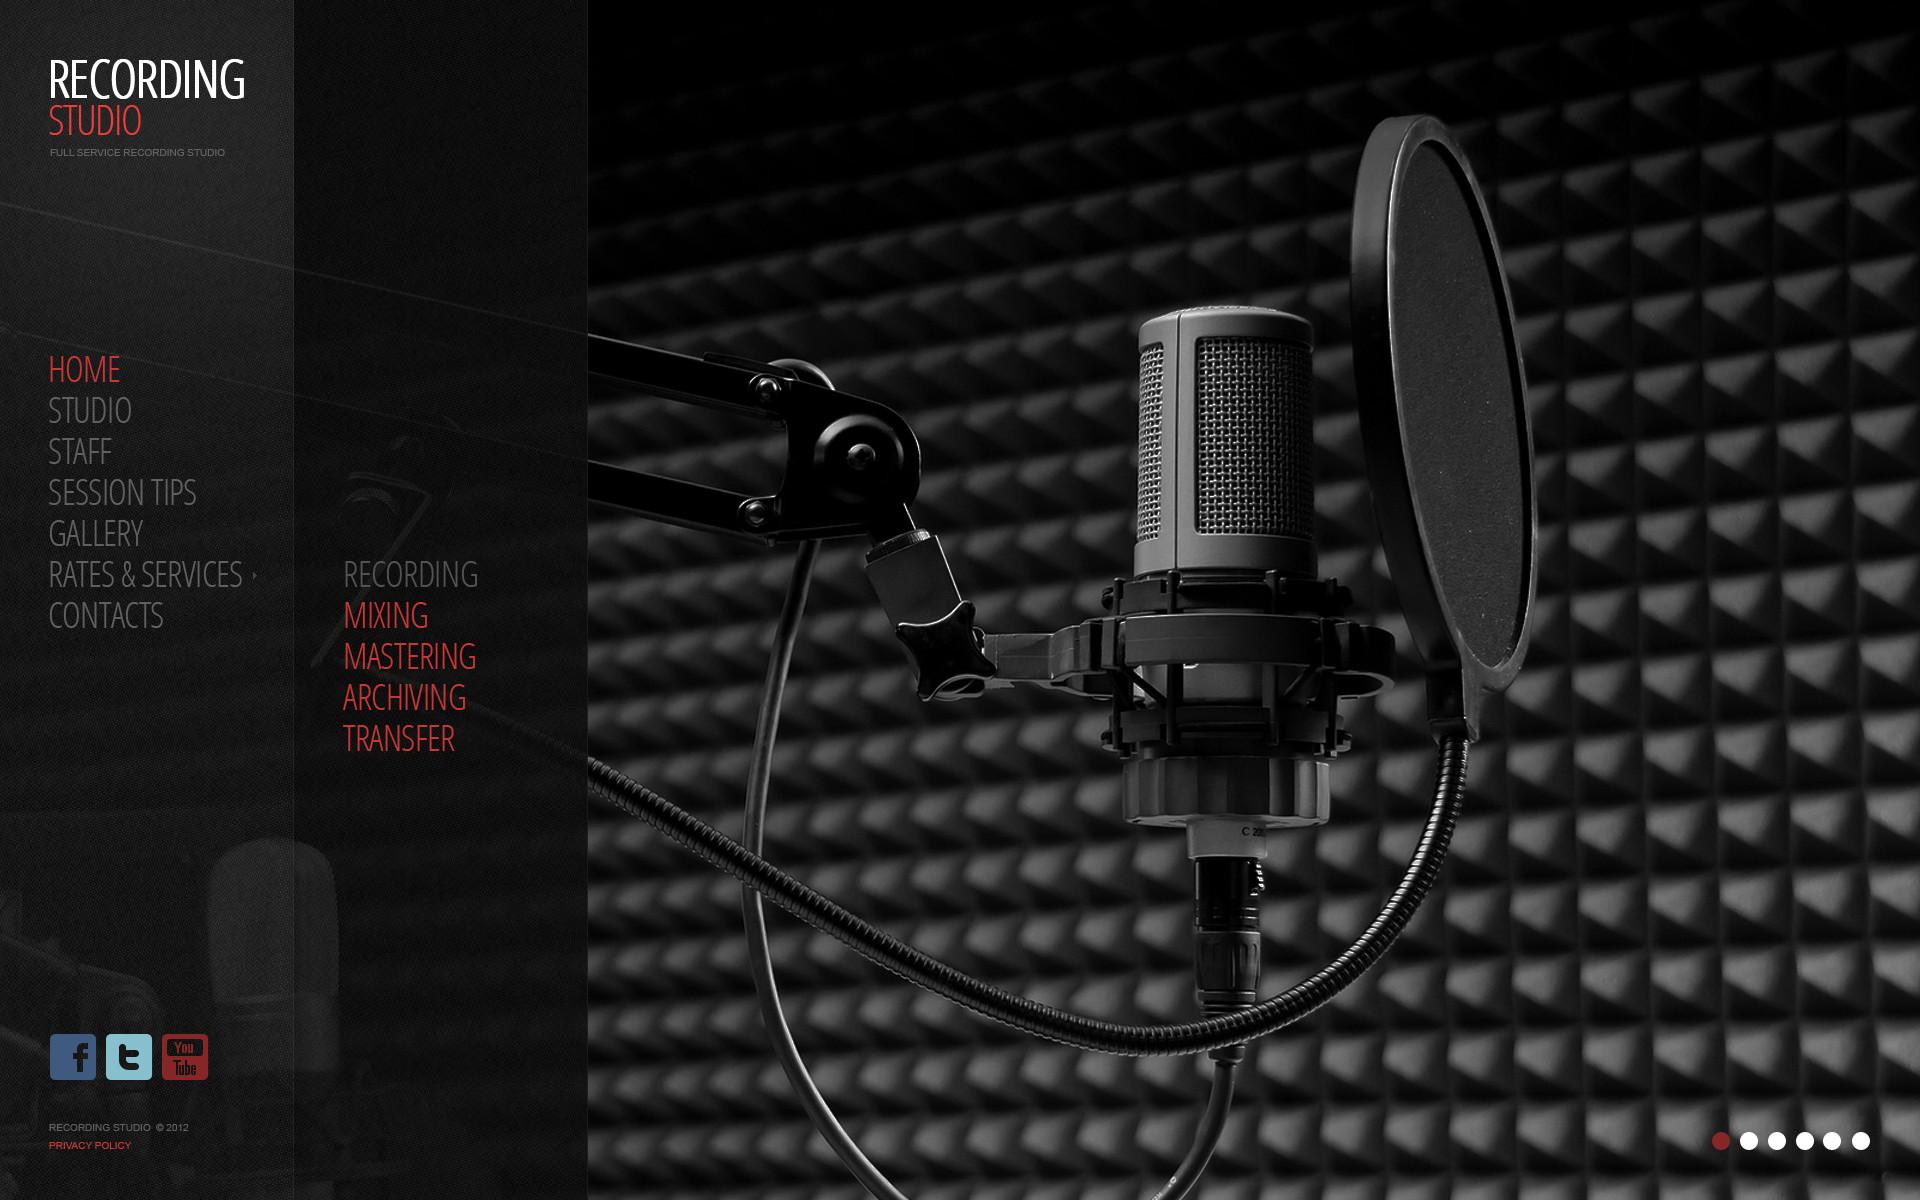 Music Recording Studio HD desktop wallpaper High